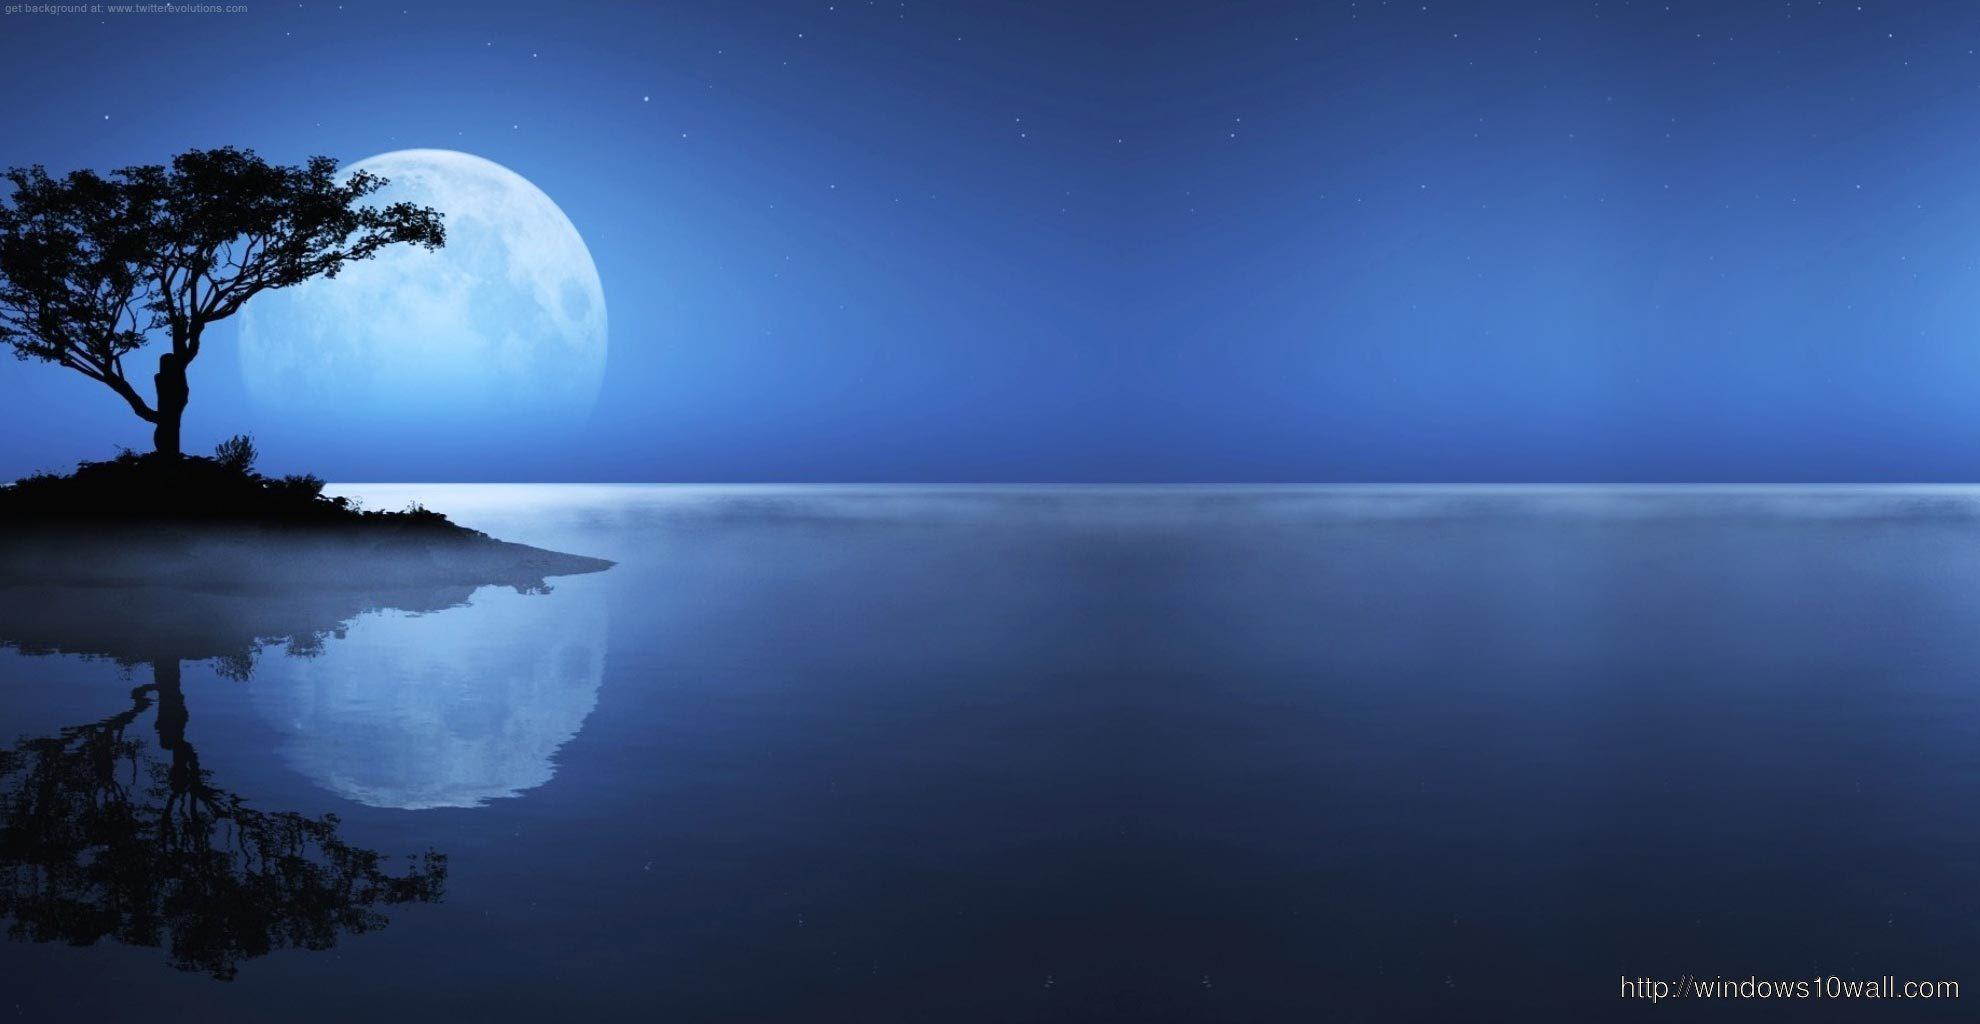 Night Moon Background Wallpaper